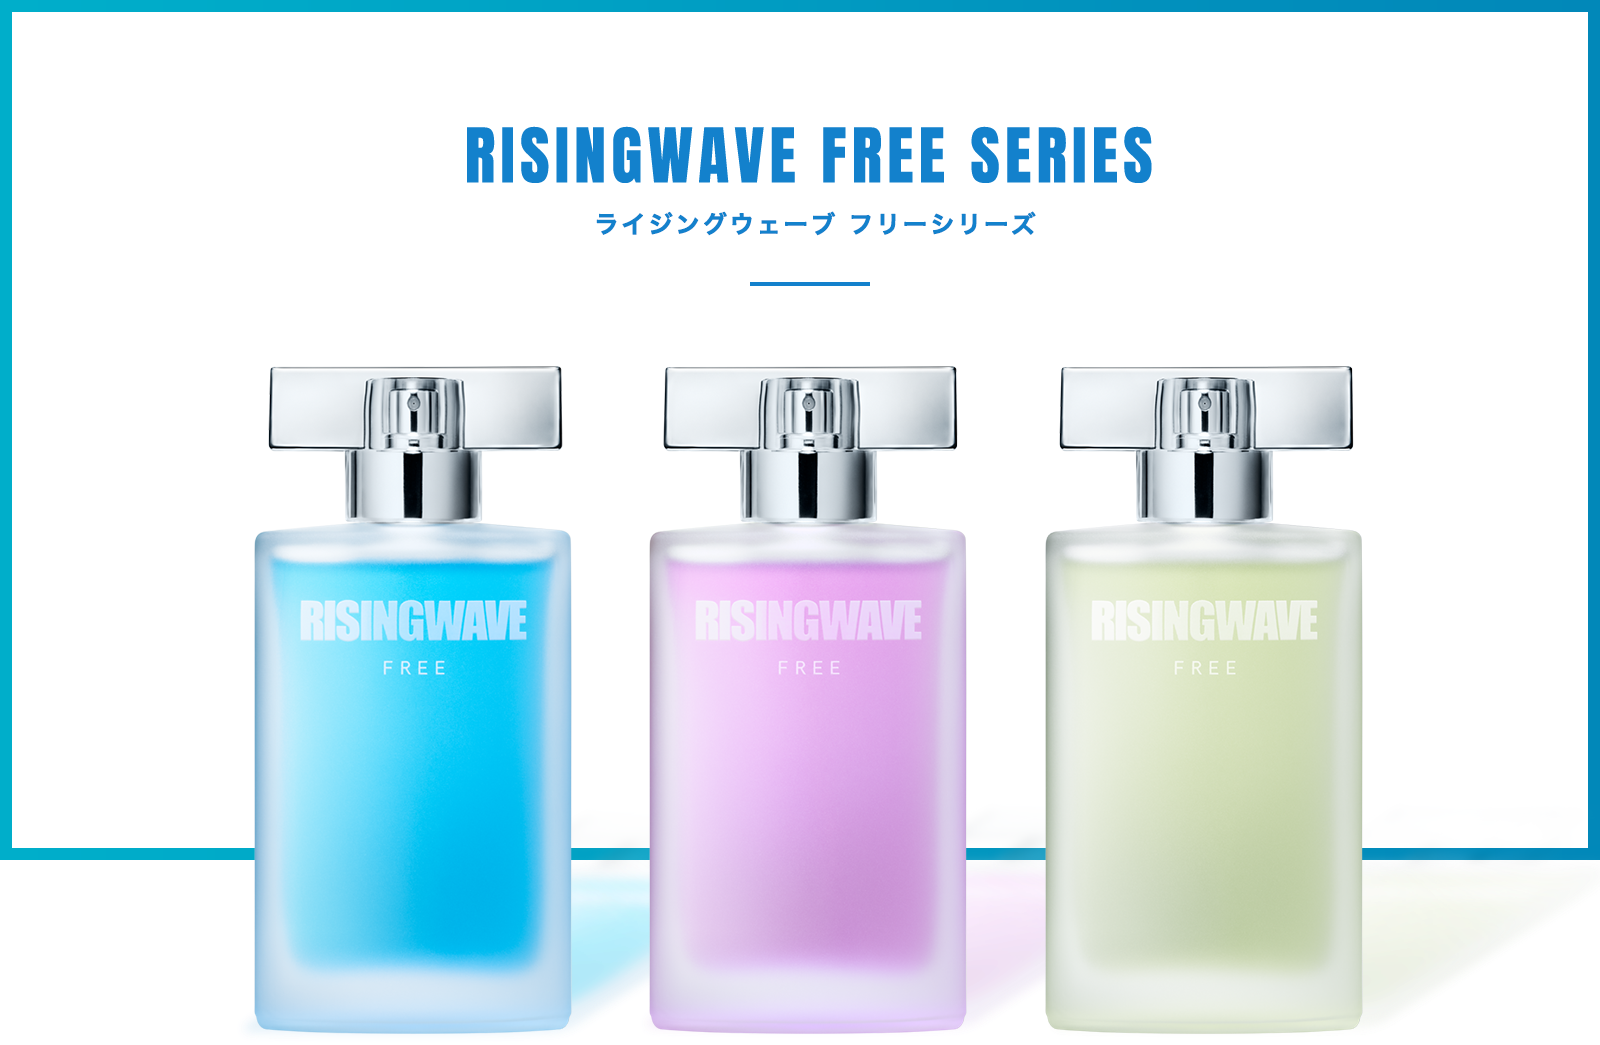 RISINGWAVE FREE SERIES ライジングウェーブ フリーシリーズ